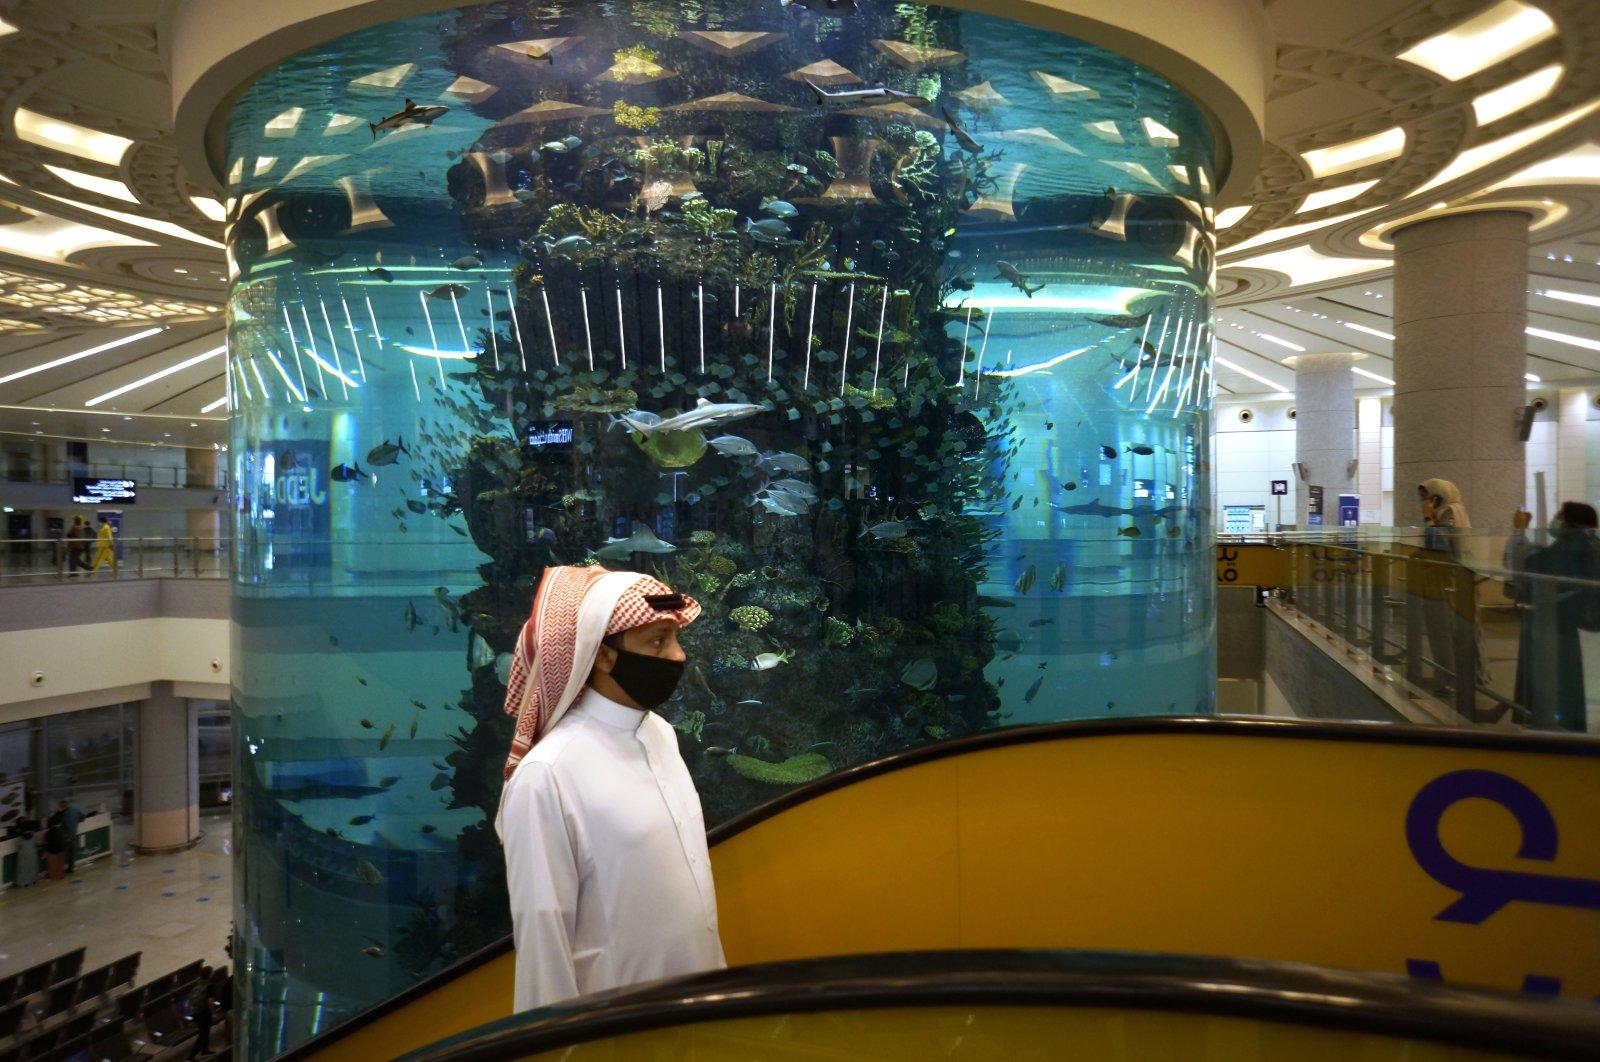 A passenger walks in front of a giant aquarium at the King Abdulaziz International Airport in Jiddah, Saudi Arabia, April 9, 2021. (AP Photo)